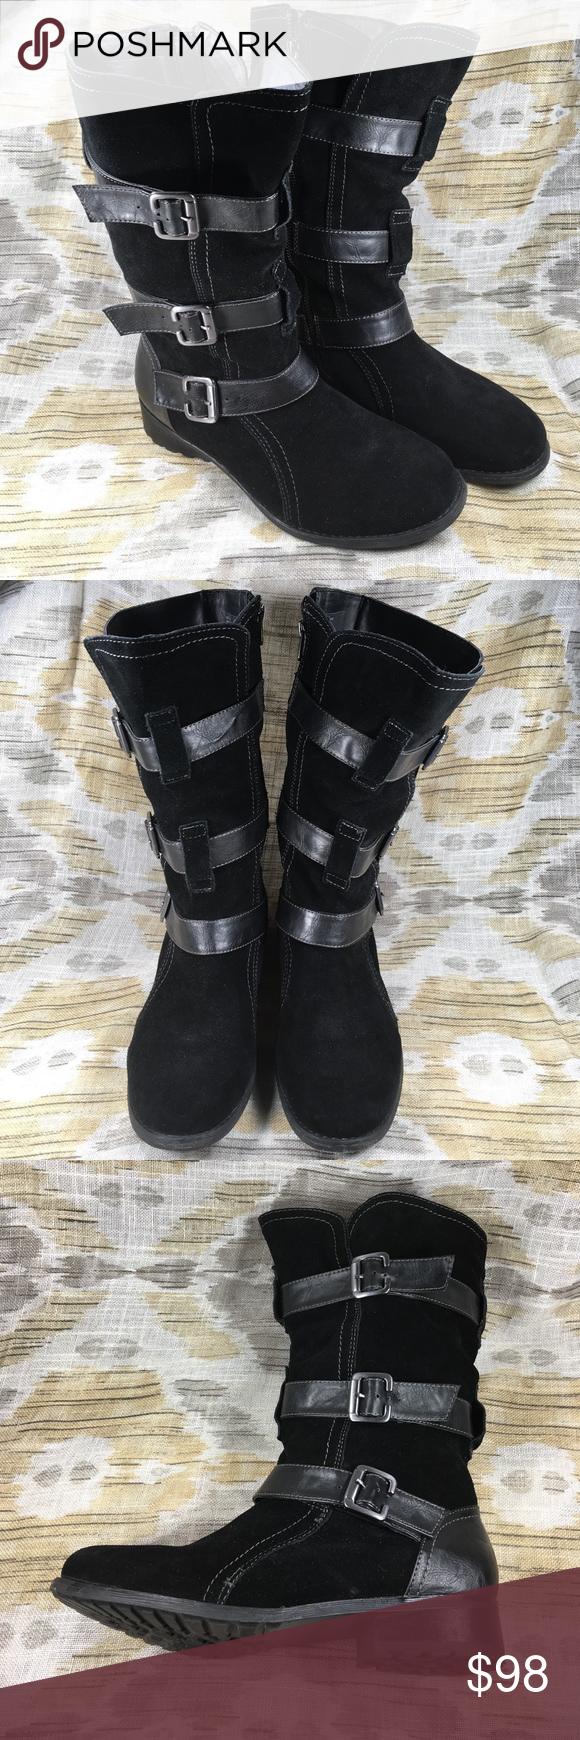 Eddie Bauer Boots Boots, Black leather boots, Clothes design